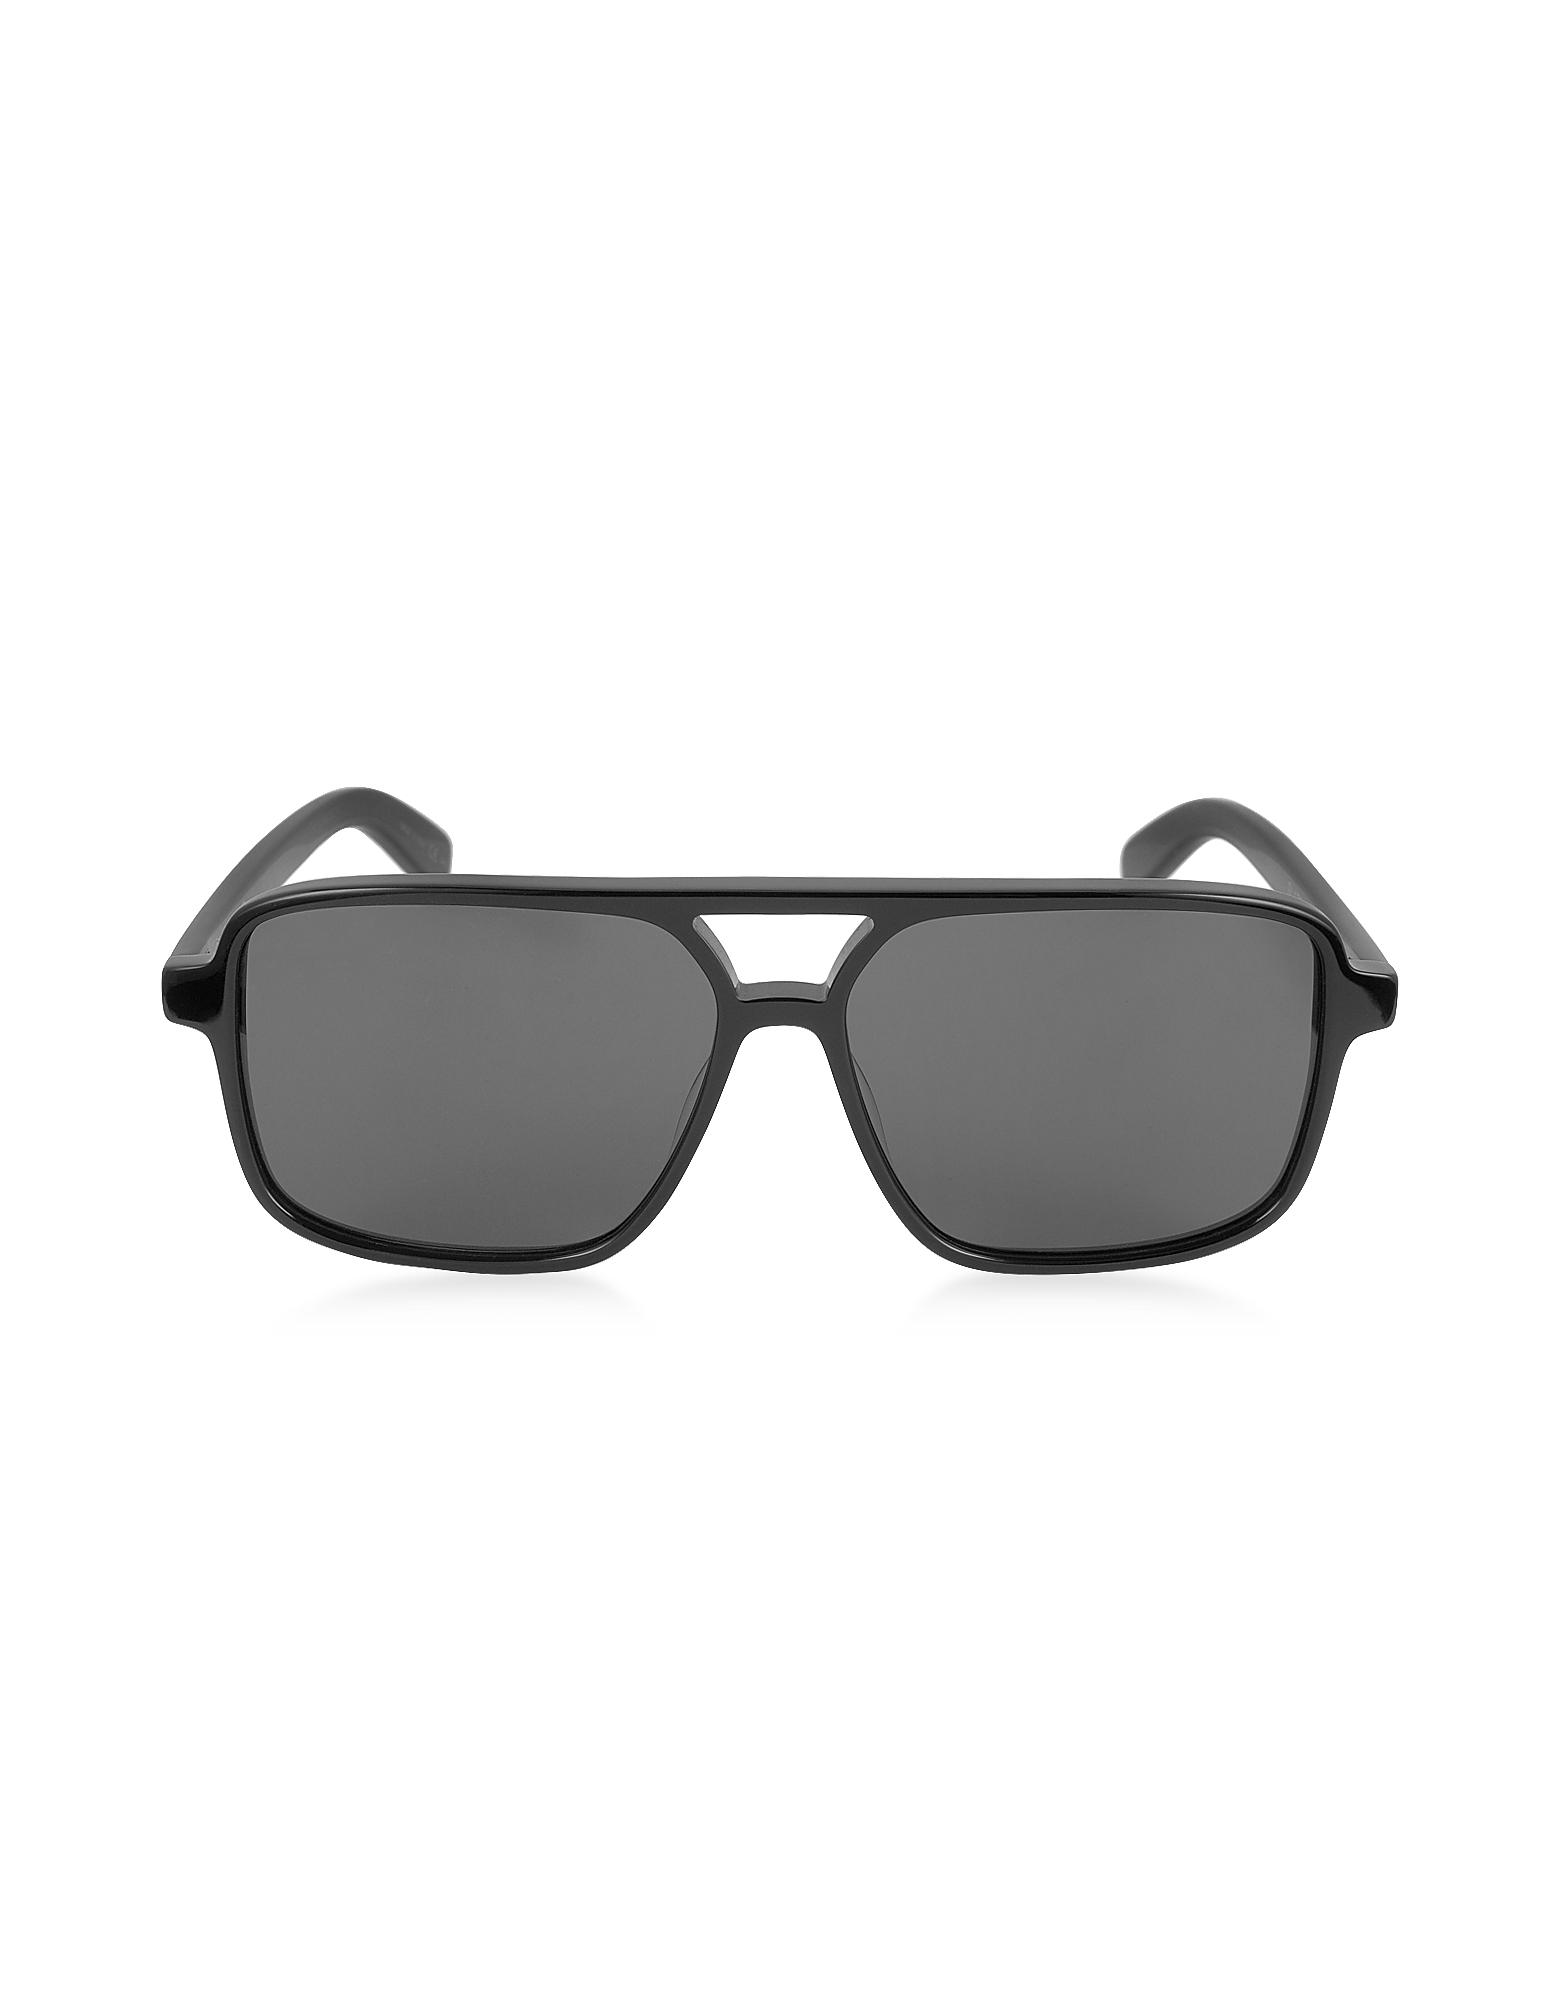 Saint Laurent Sunglasses, SL 176 Acetate Shield Frame Unisex Sunglasses